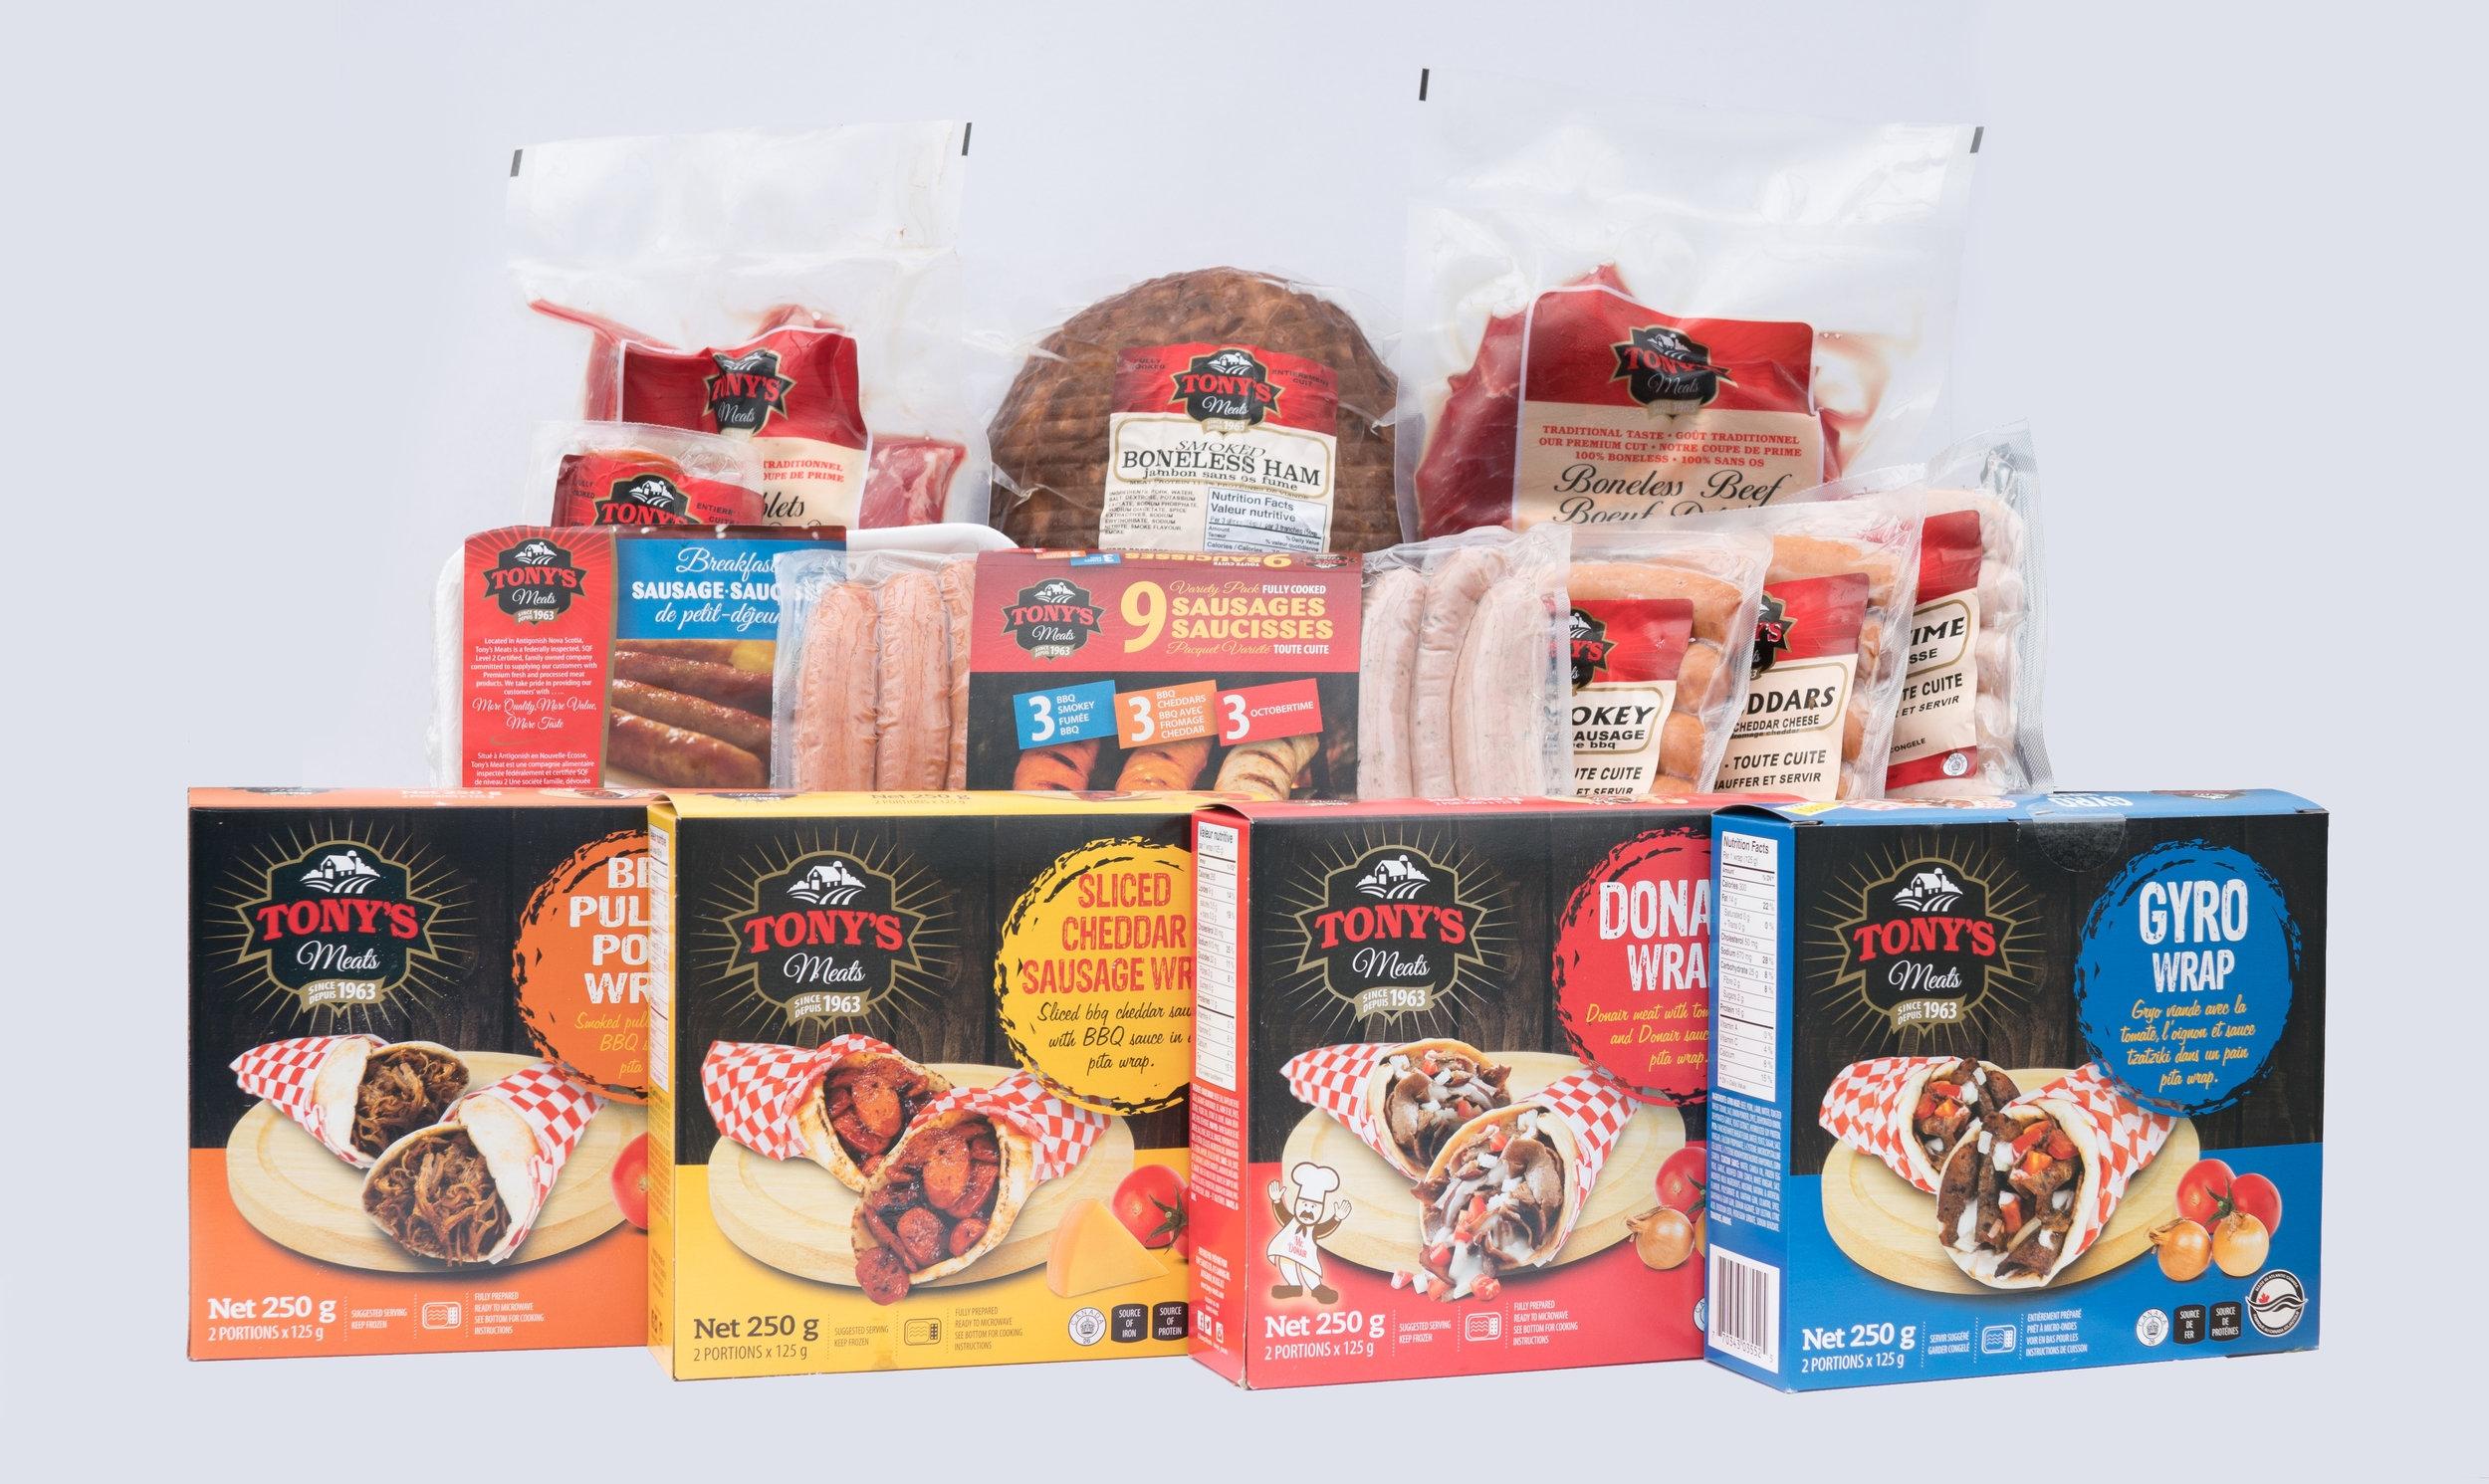 Tonys Product Line.jpg